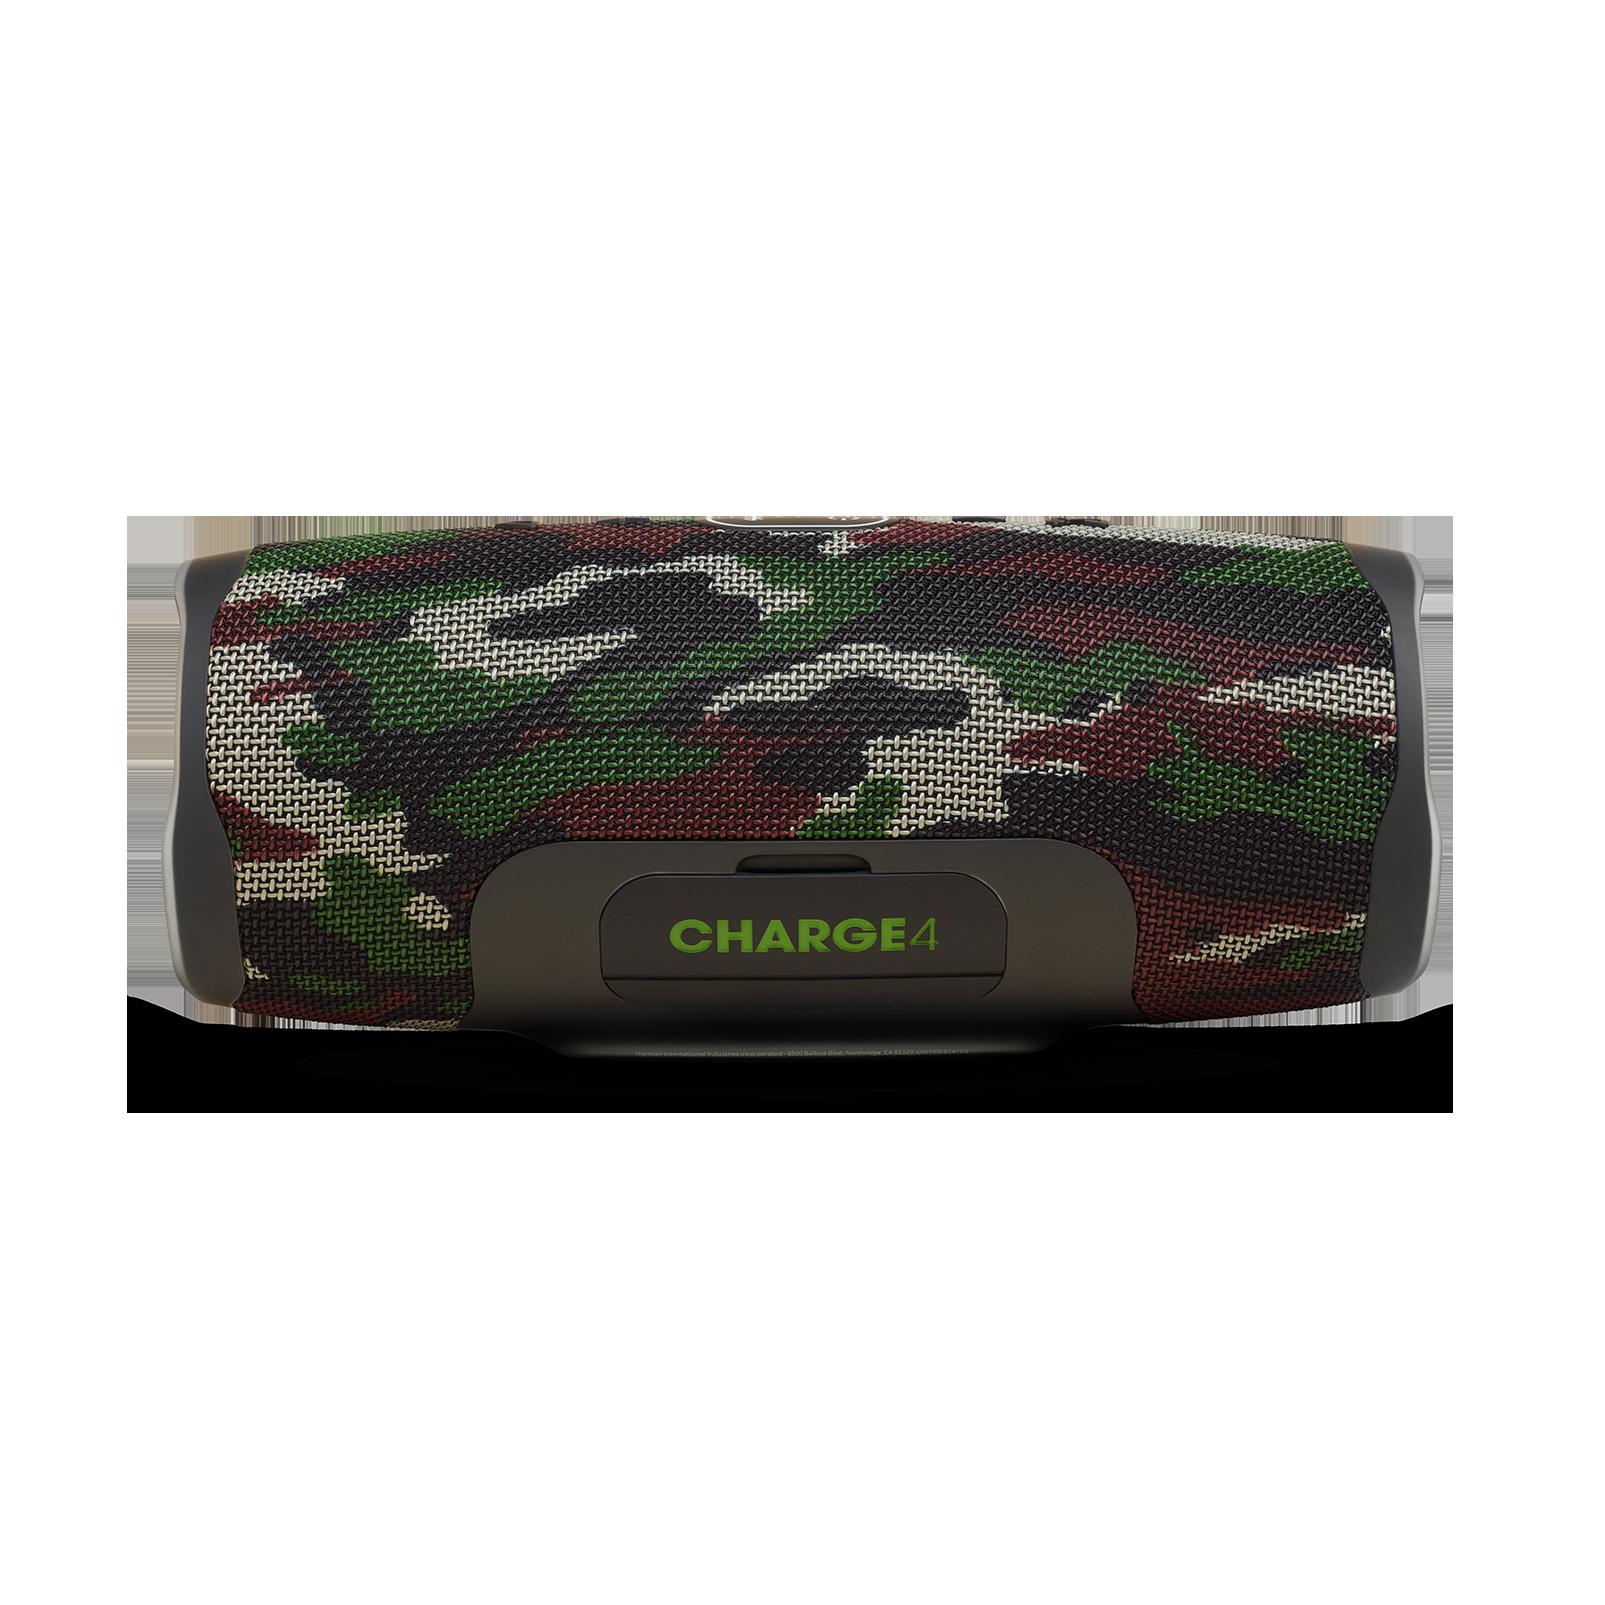 JBL Charge 4 - Squad - Portable Bluetooth speaker - Back